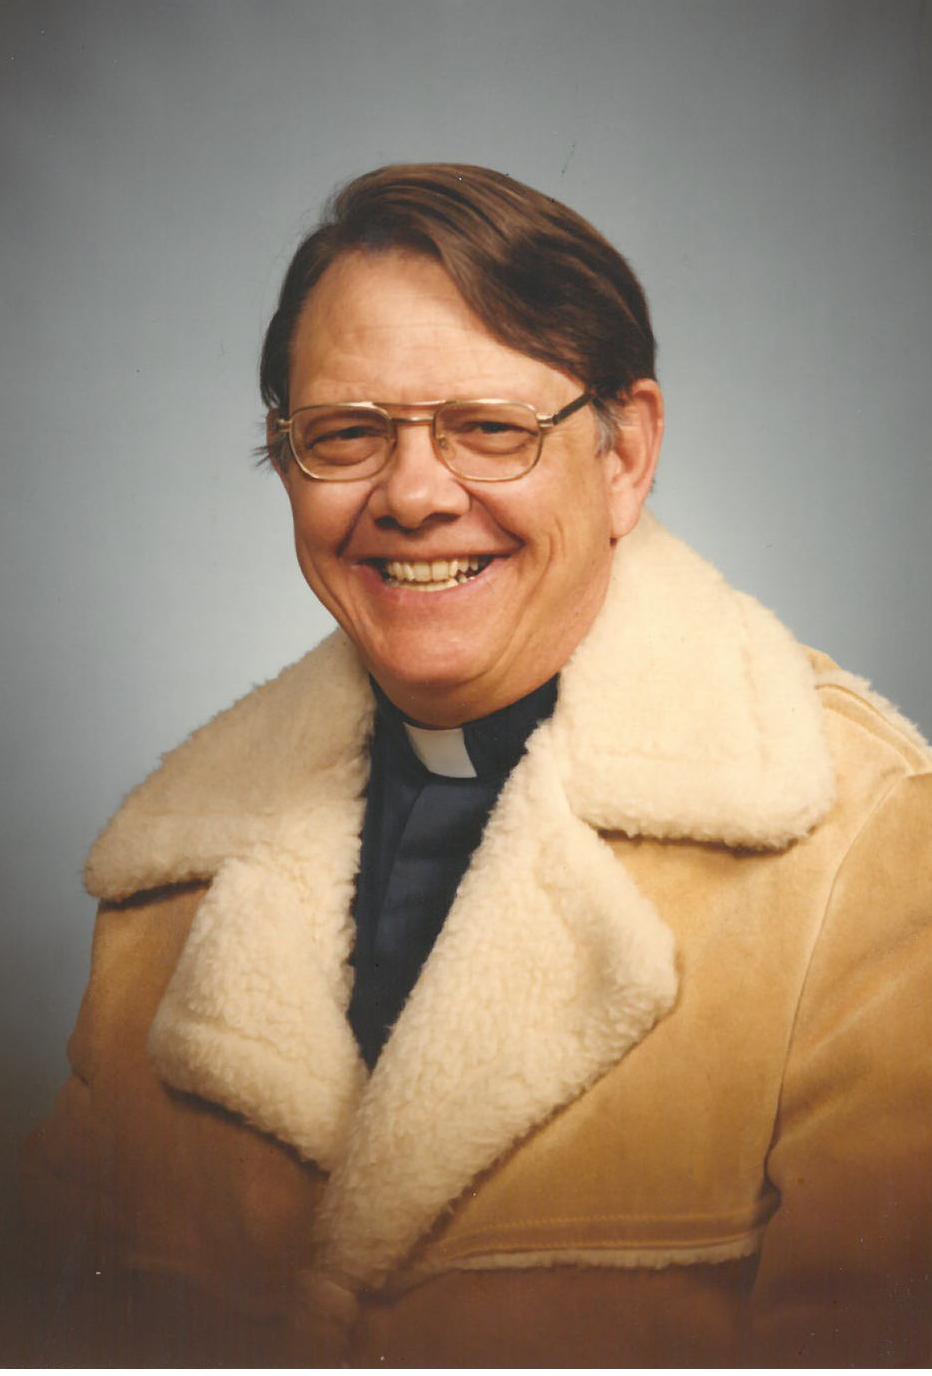 The Reverend Allen P. Price, 1st Vicar of St. Stephen's - March 1960-April 1966